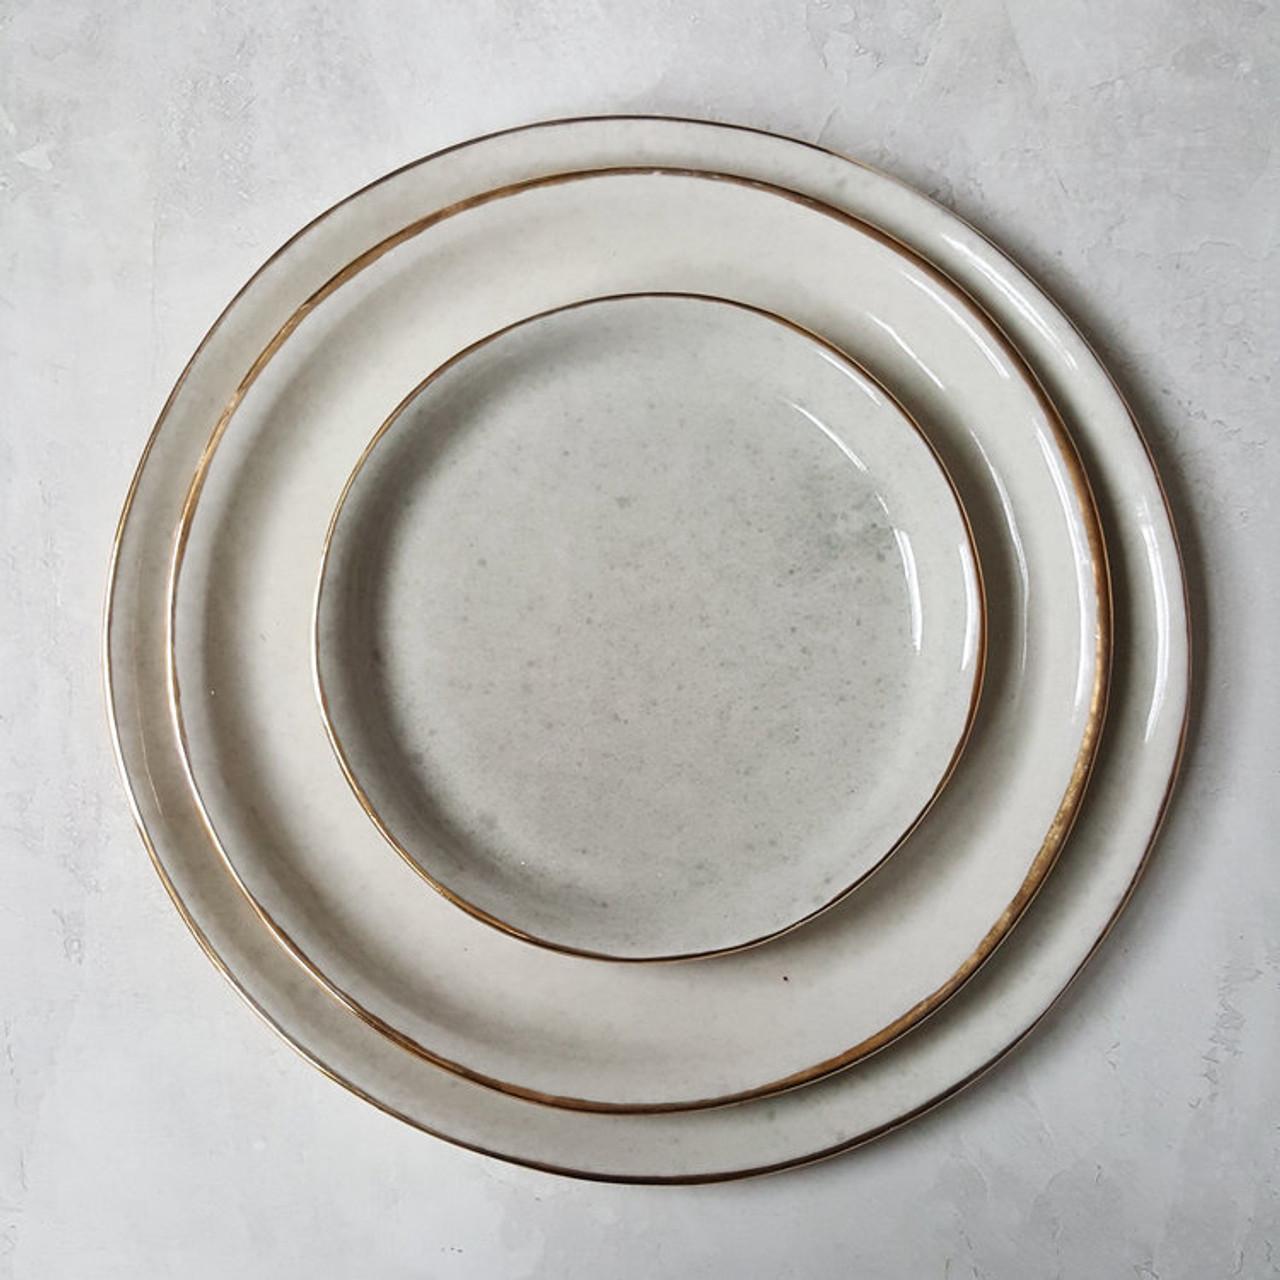 Apricity Ceramics - Dew Collection Dinnerware set (Grey)